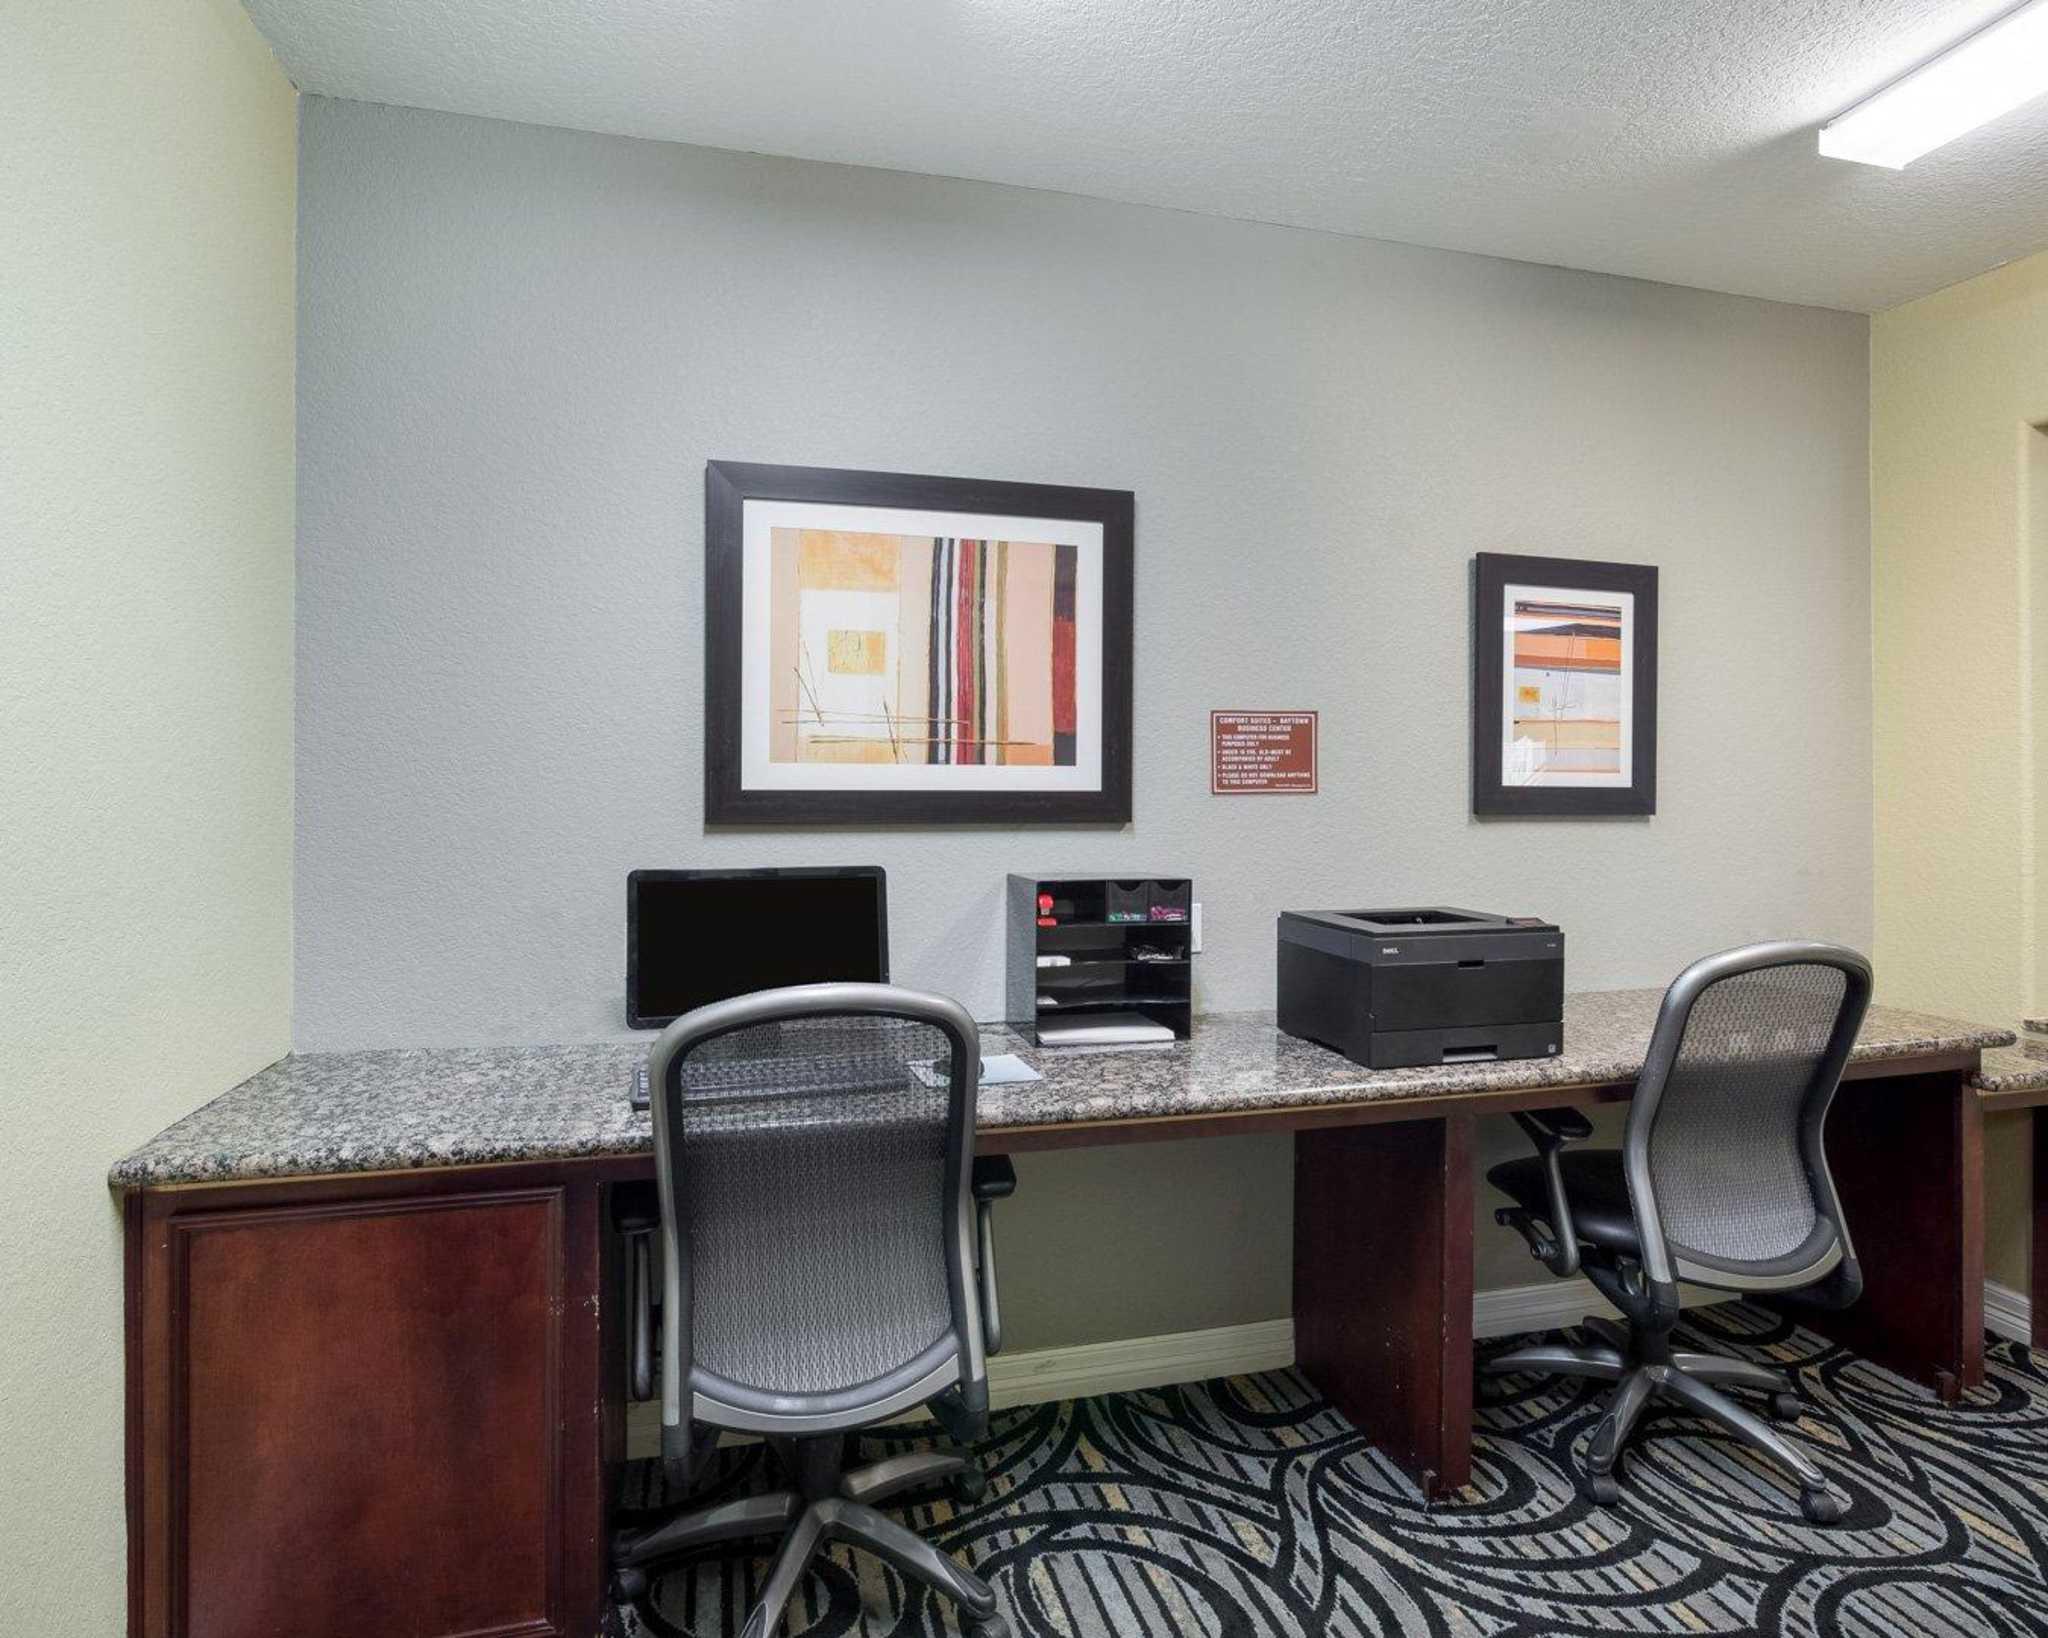 Comfort Suites image 56